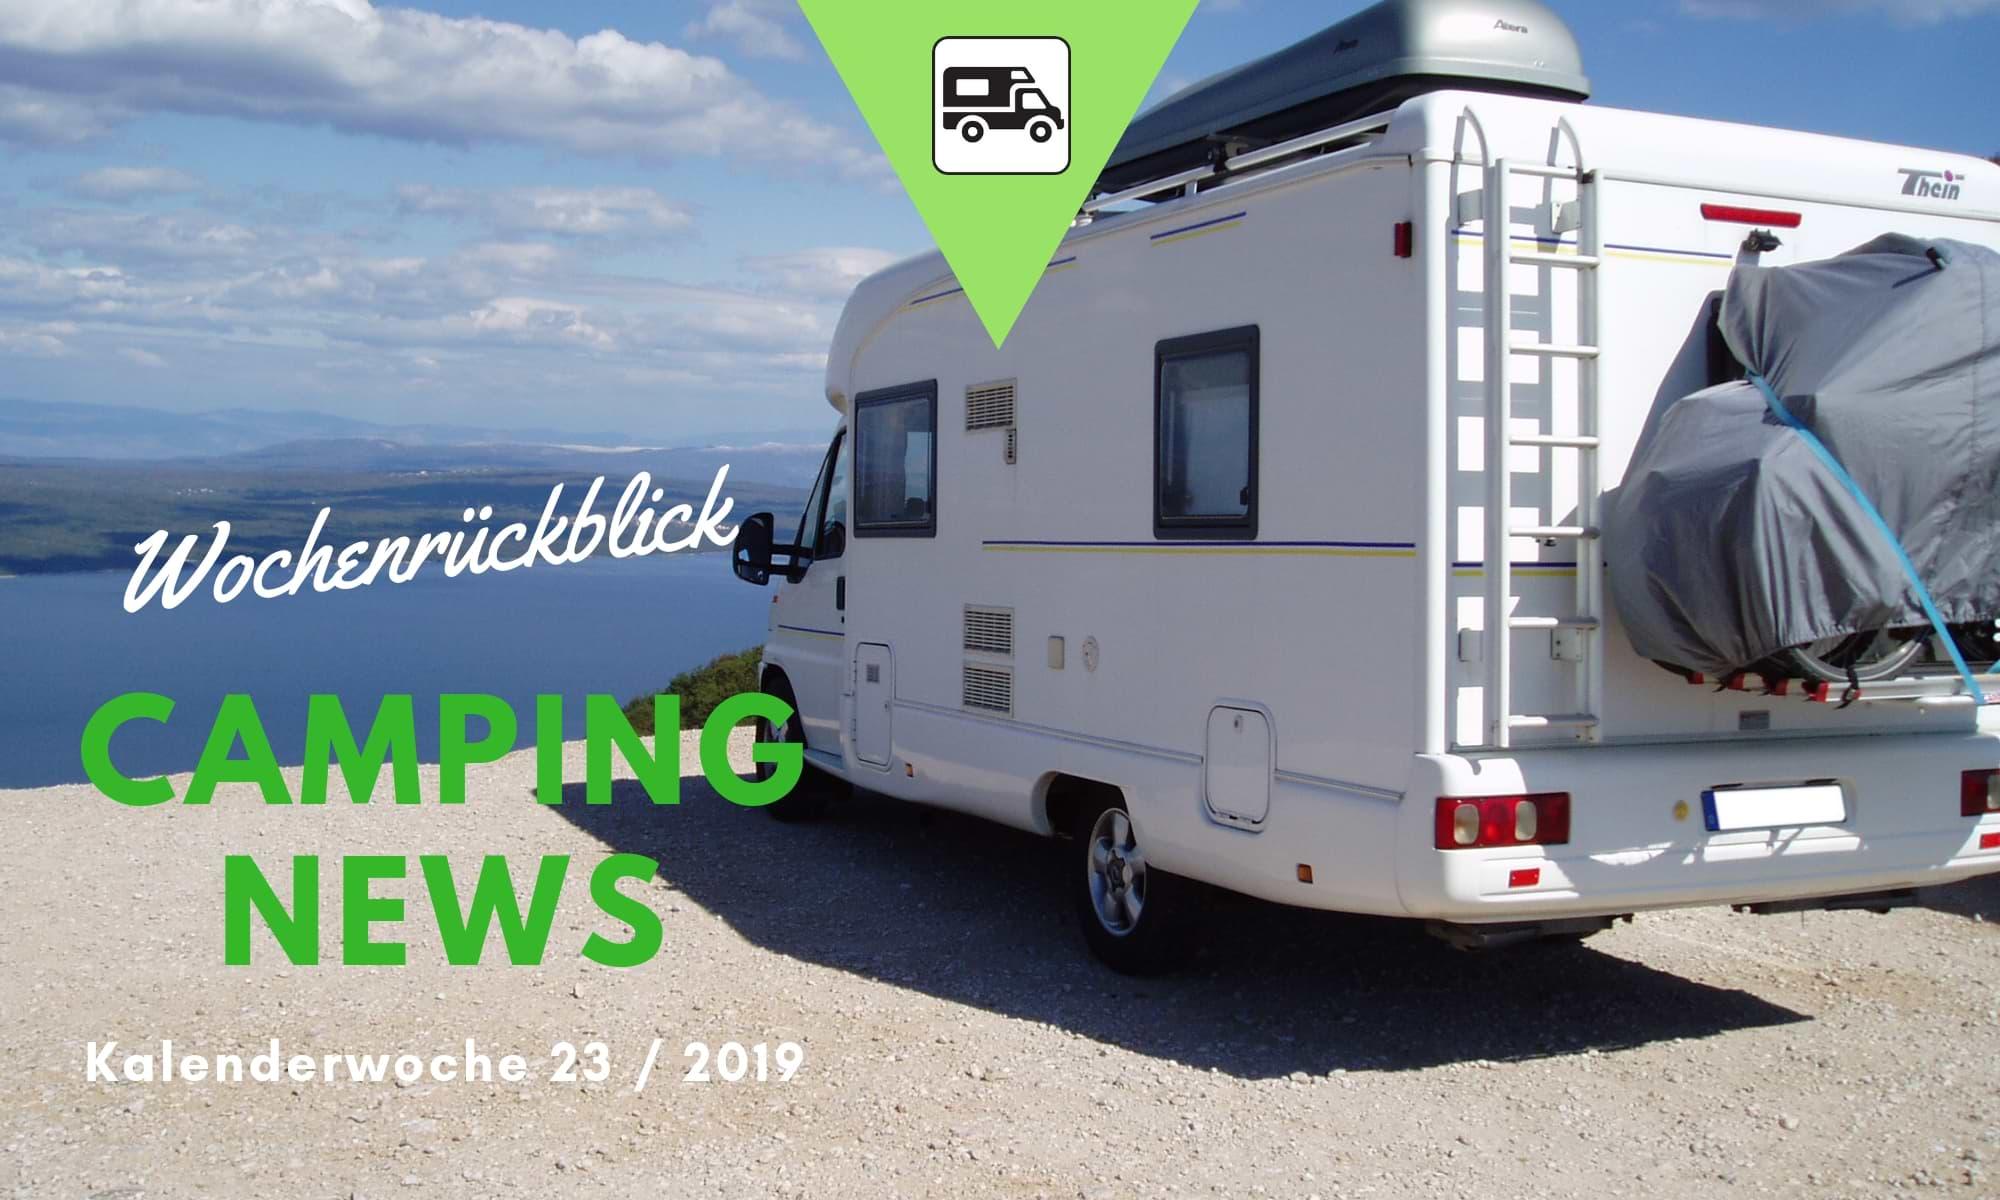 Wochenrückblick Camping News KW23-2019